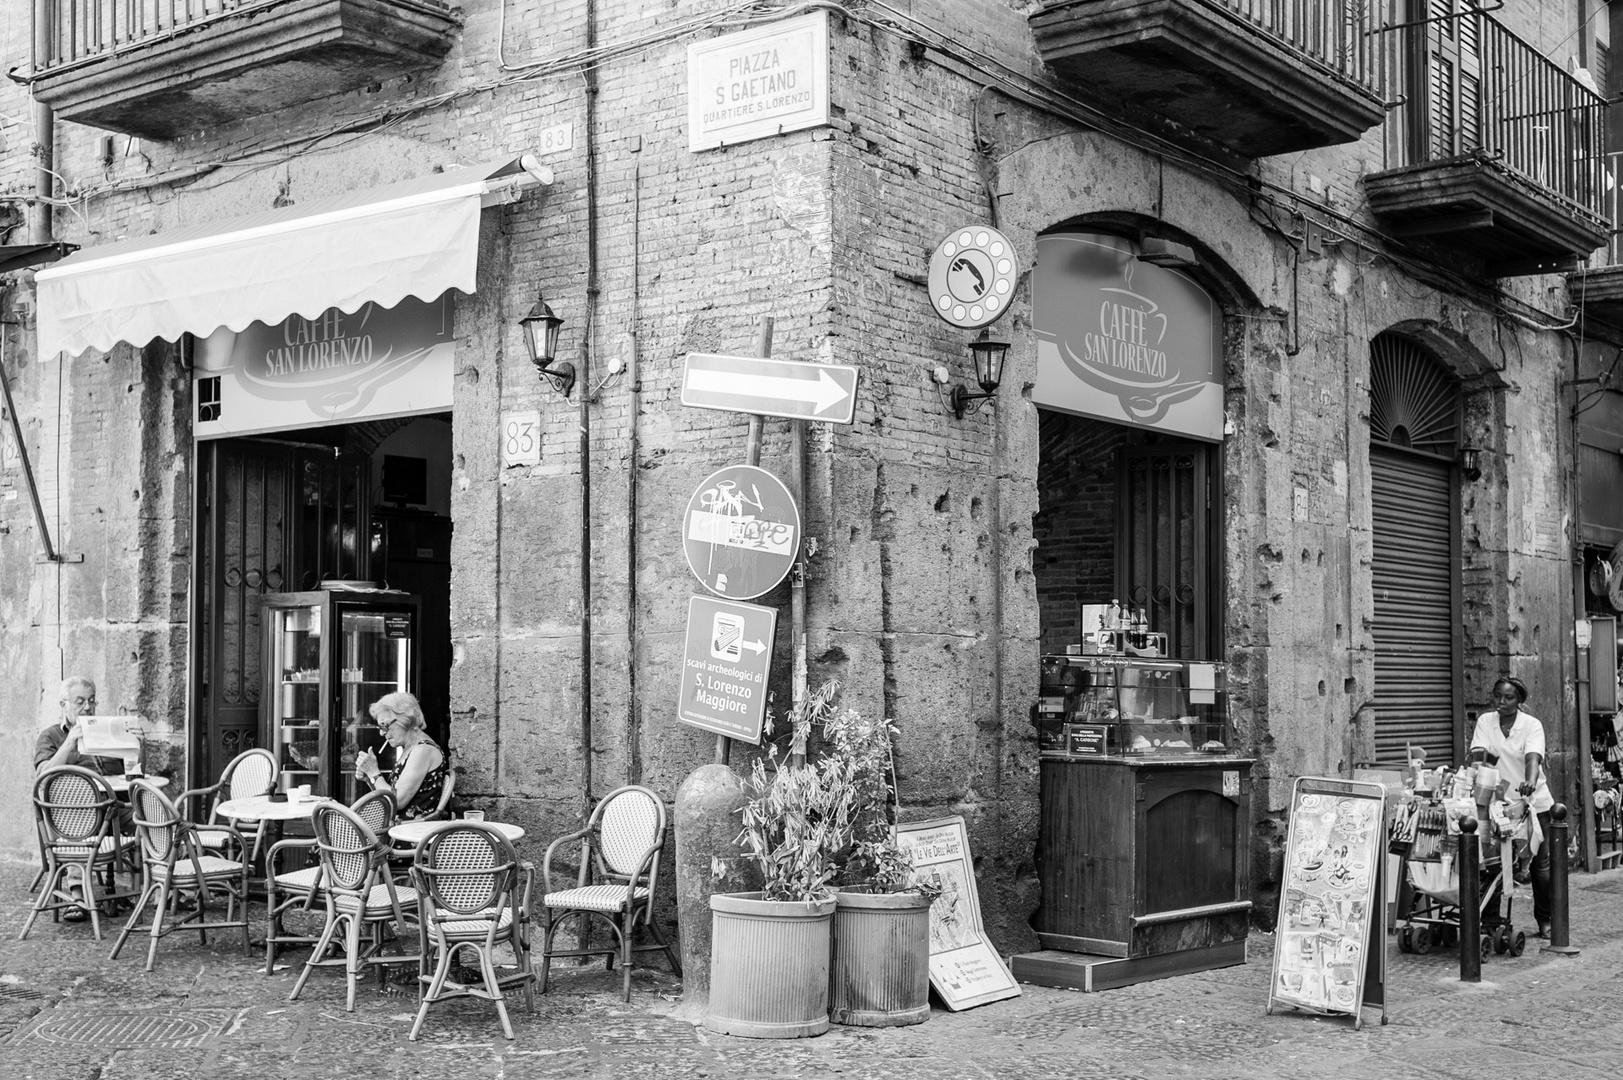 Nápoles - Piazza san Gaetano